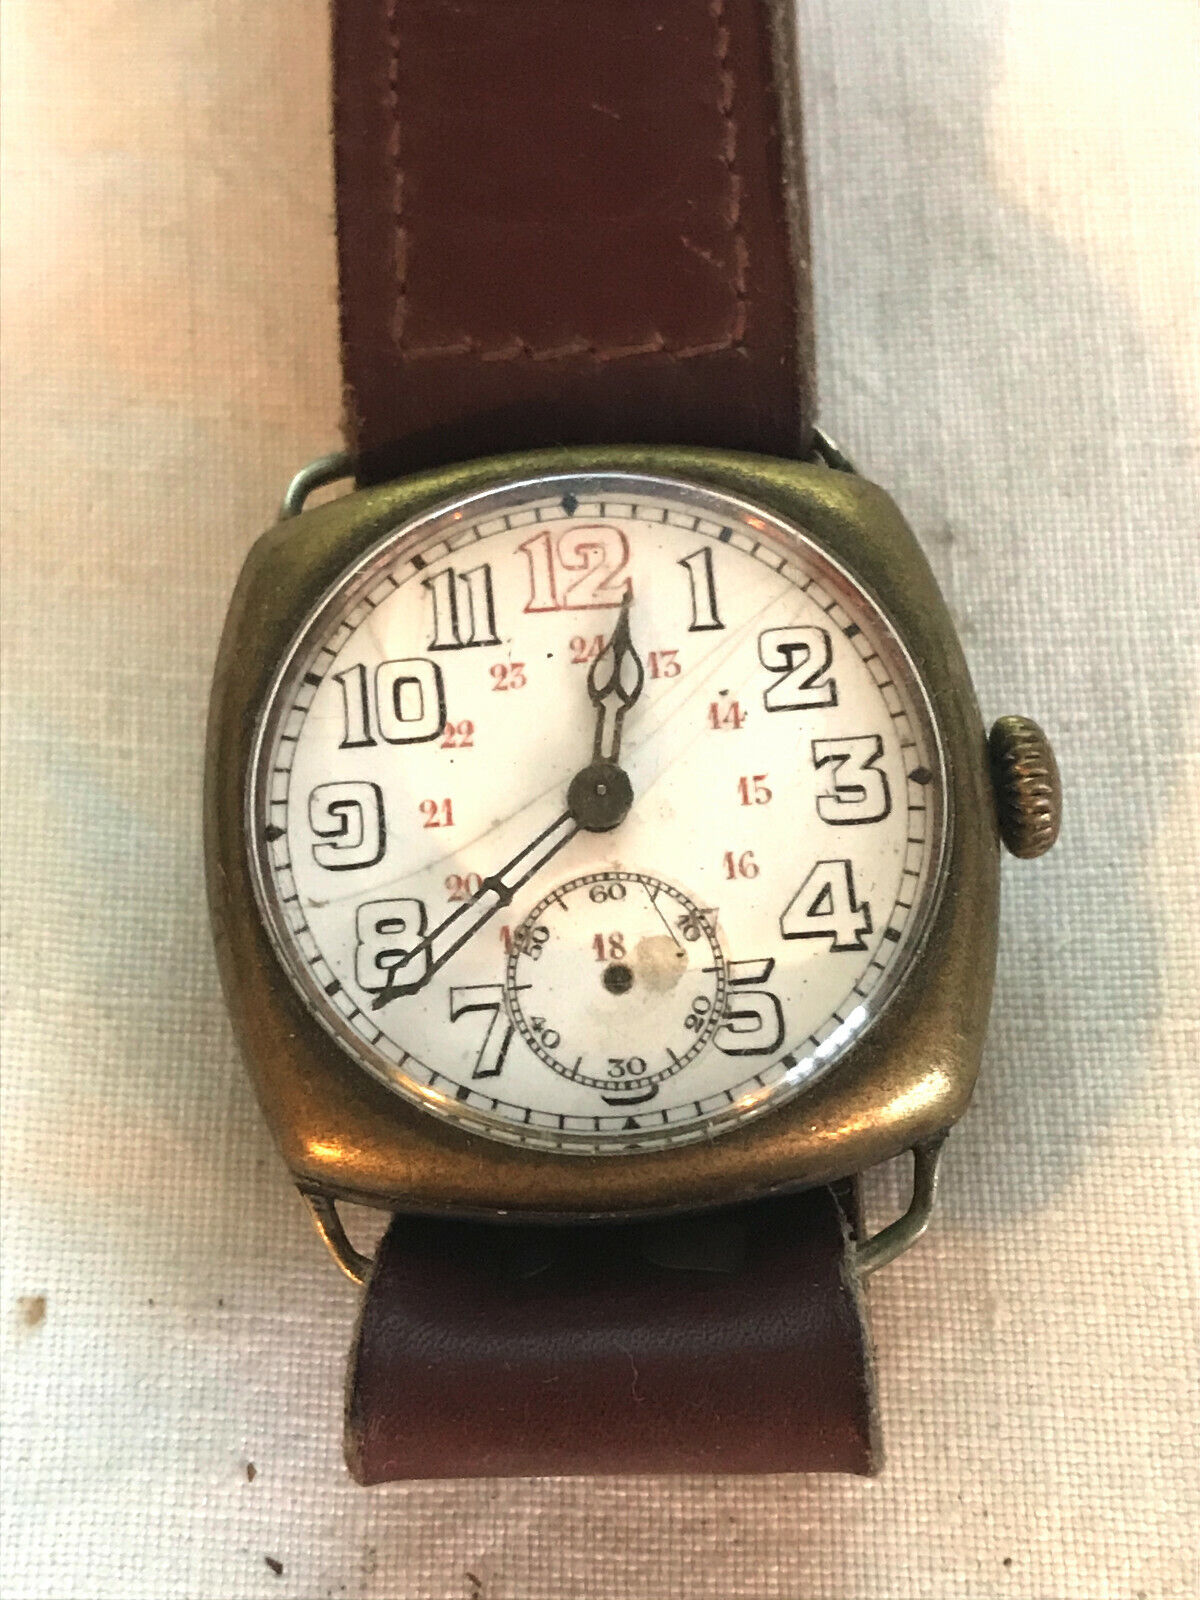 Montre militaire de poilu ww1 french trench watch 1915 a restaurer bracelet cuir